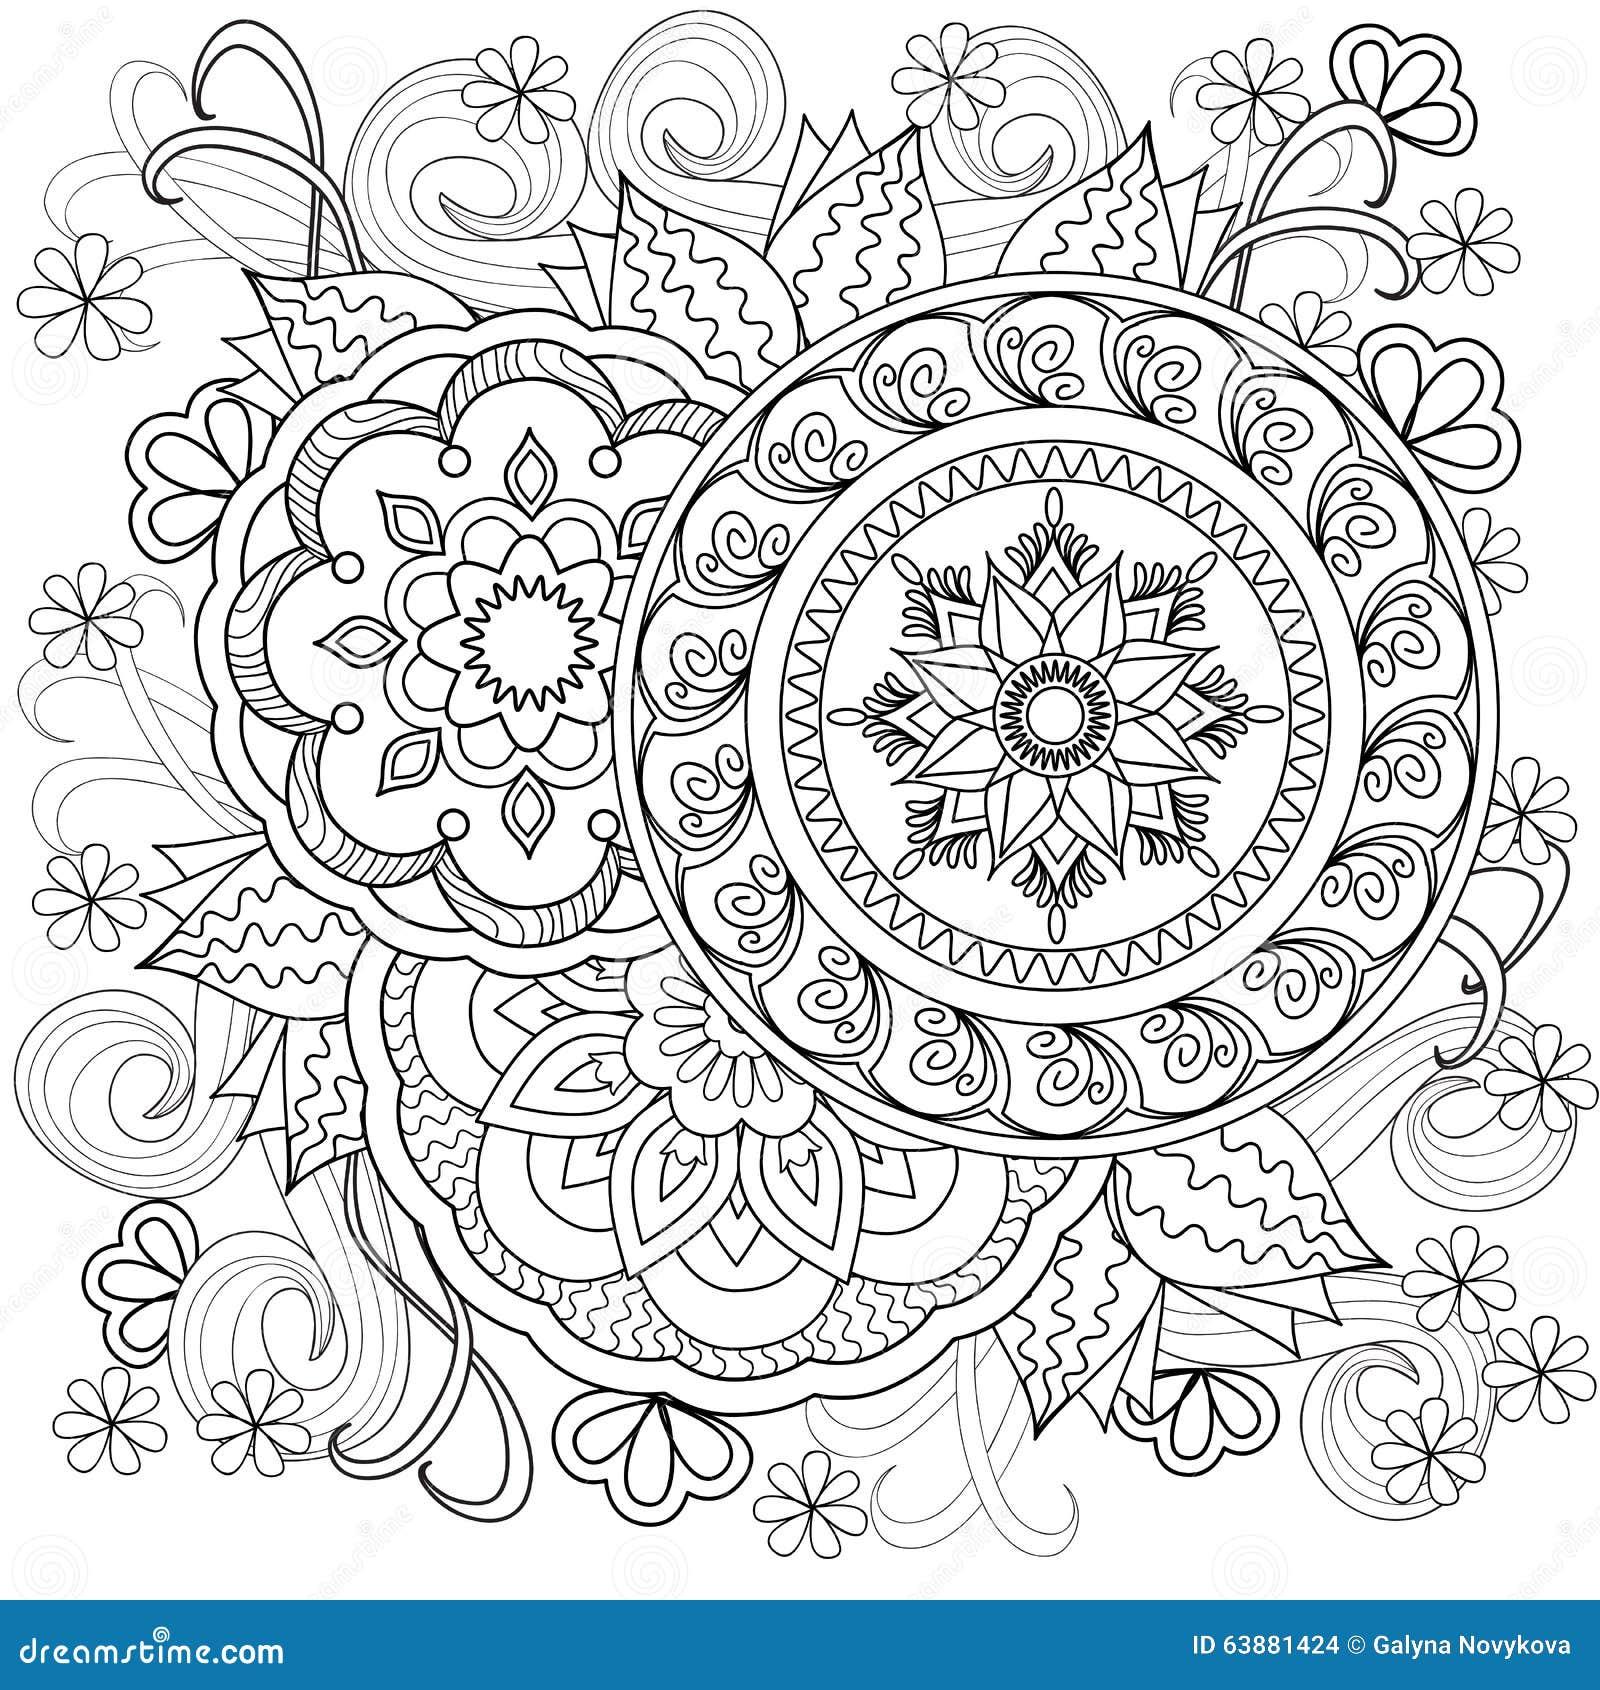 Flowers Mandalas B10 Vektor Abbildung Illustration Von